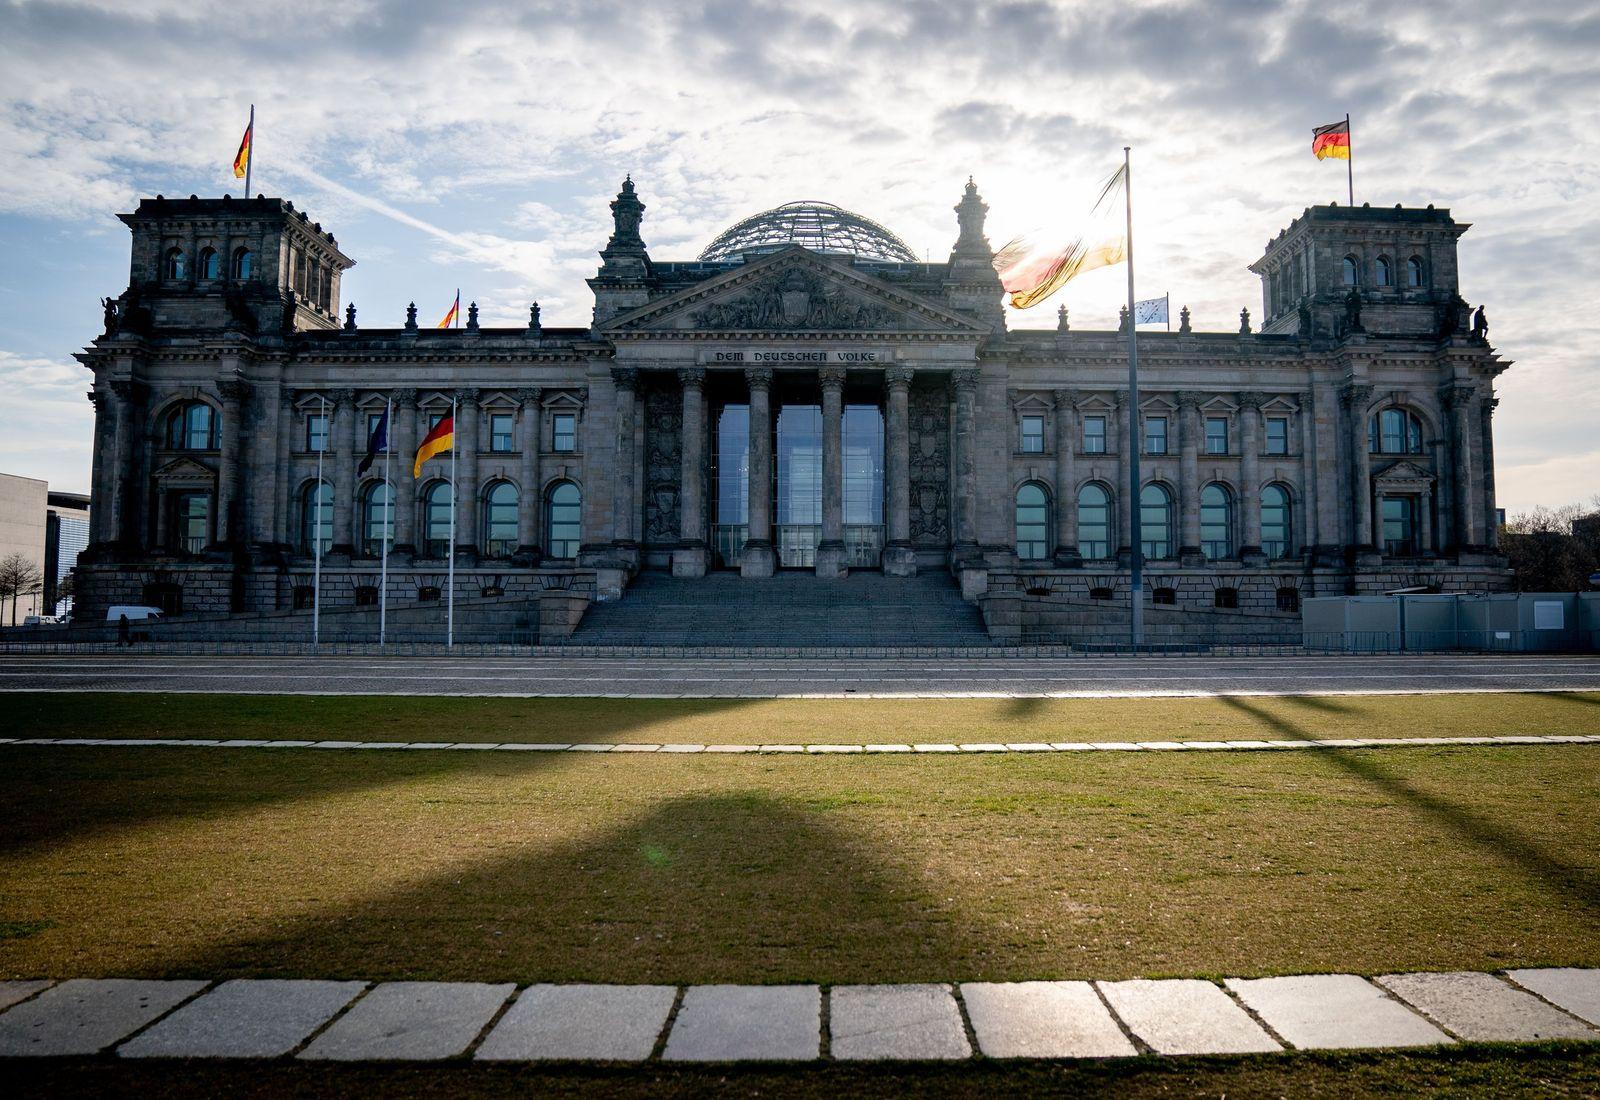 Coronavirus - Bundestag